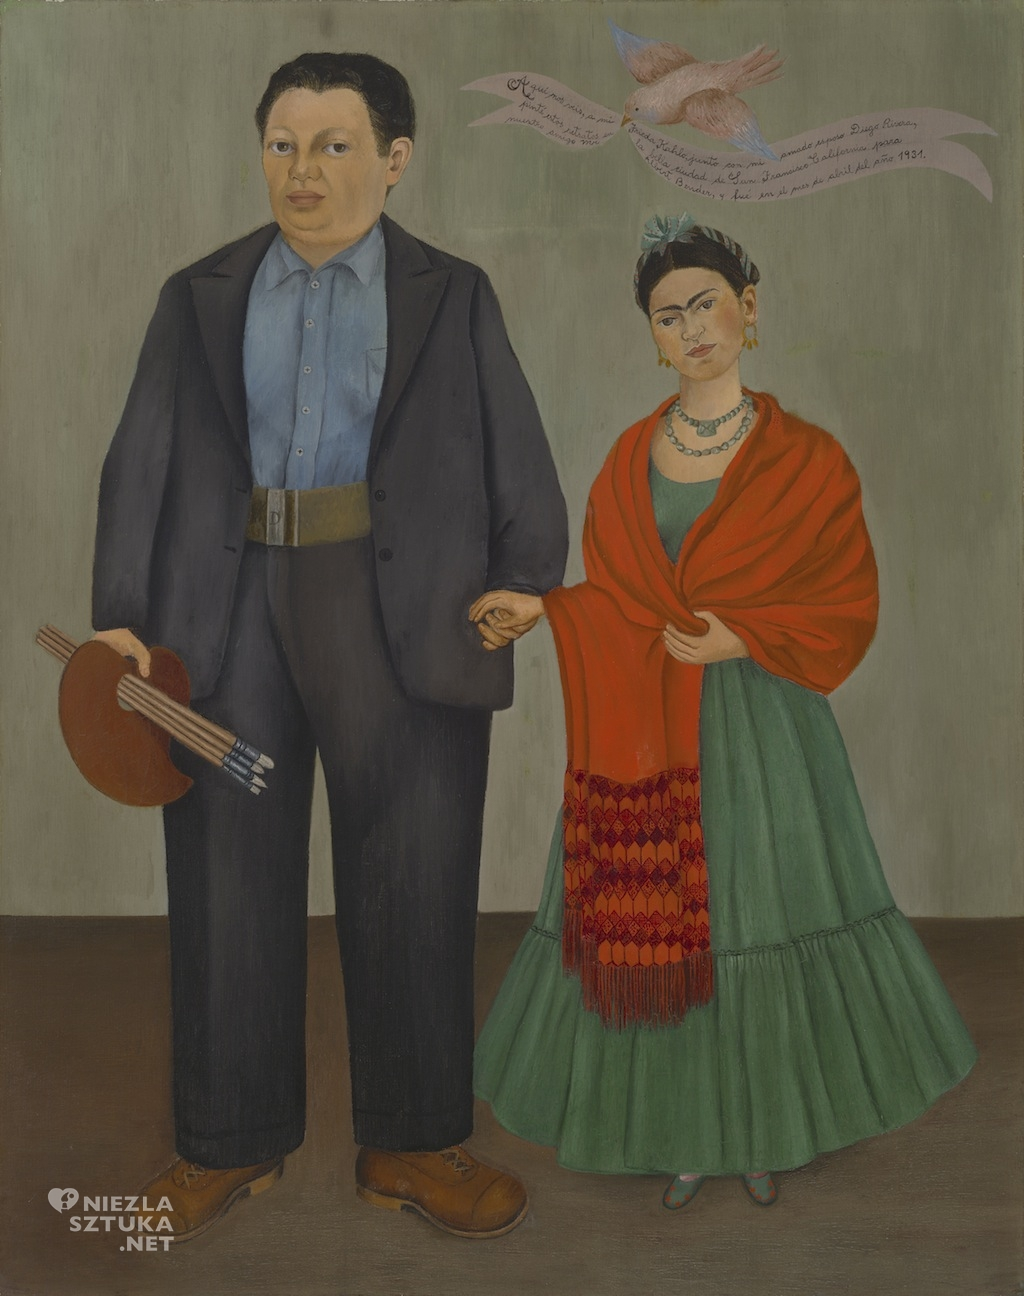 Frida Kahlo, Diego Rivera, Niezła sztuka